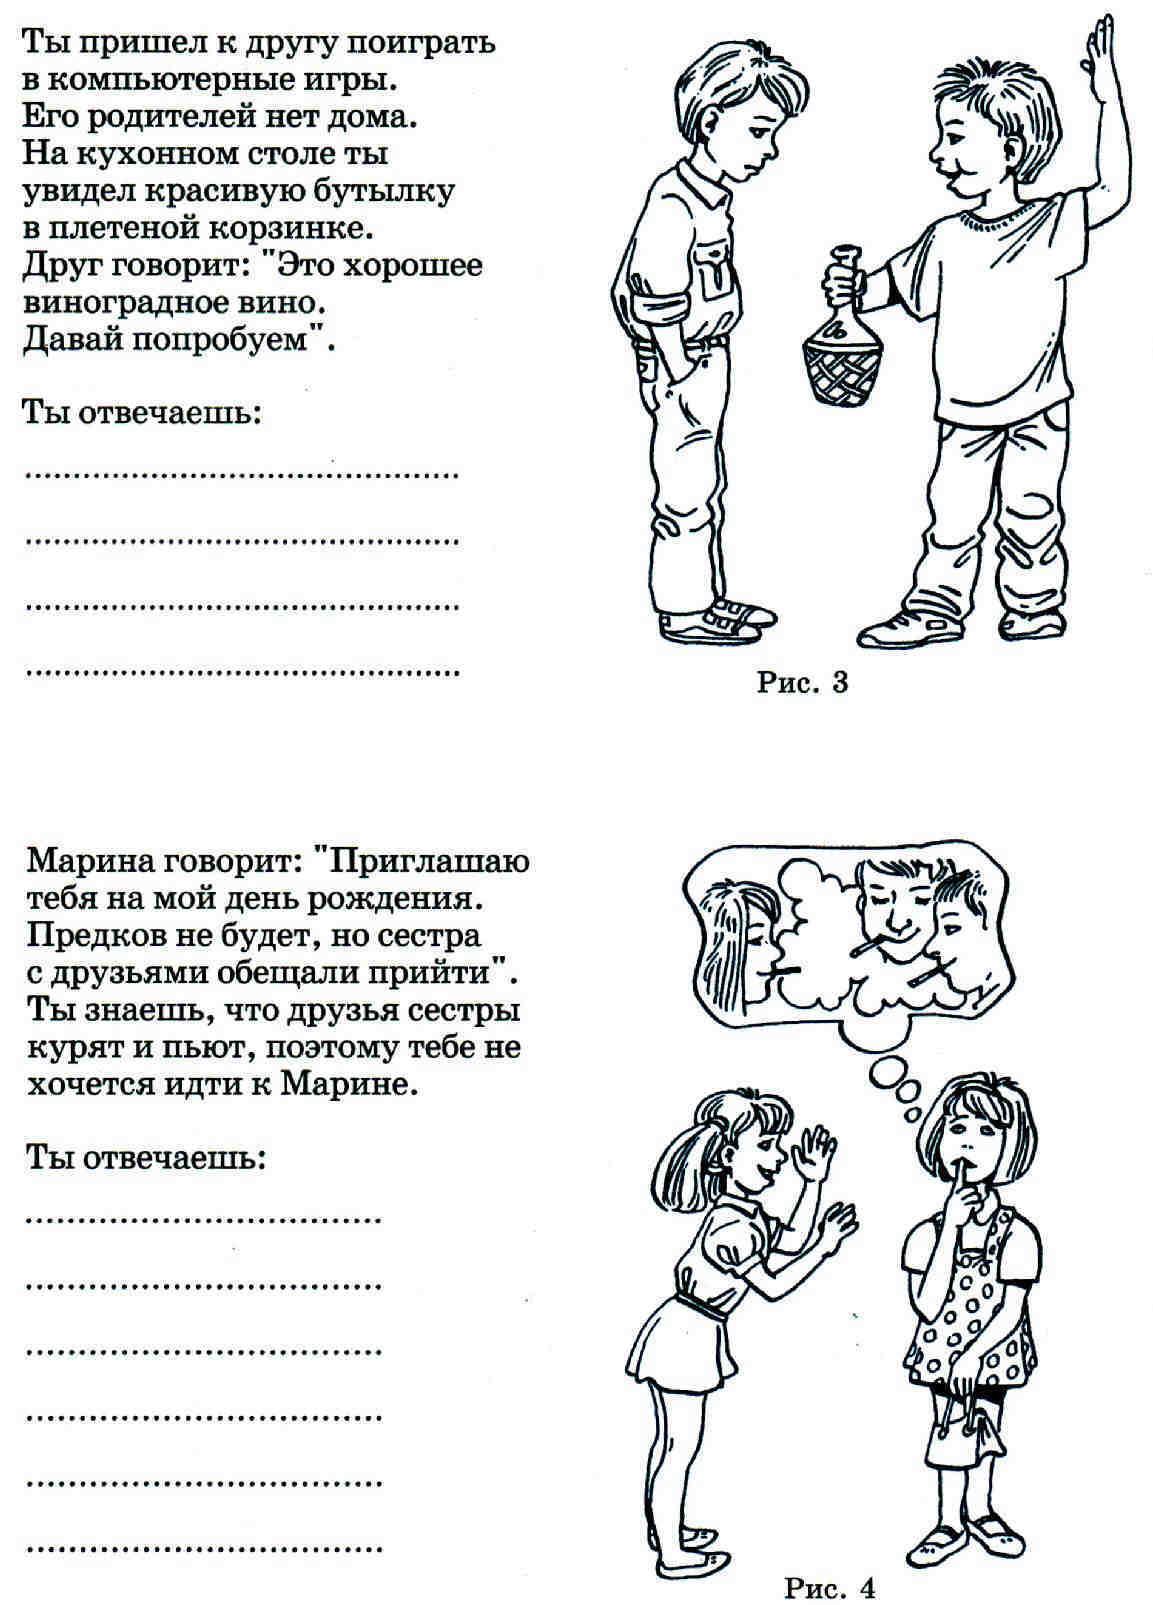 http://school10-zima.narod.ru/2.JPG